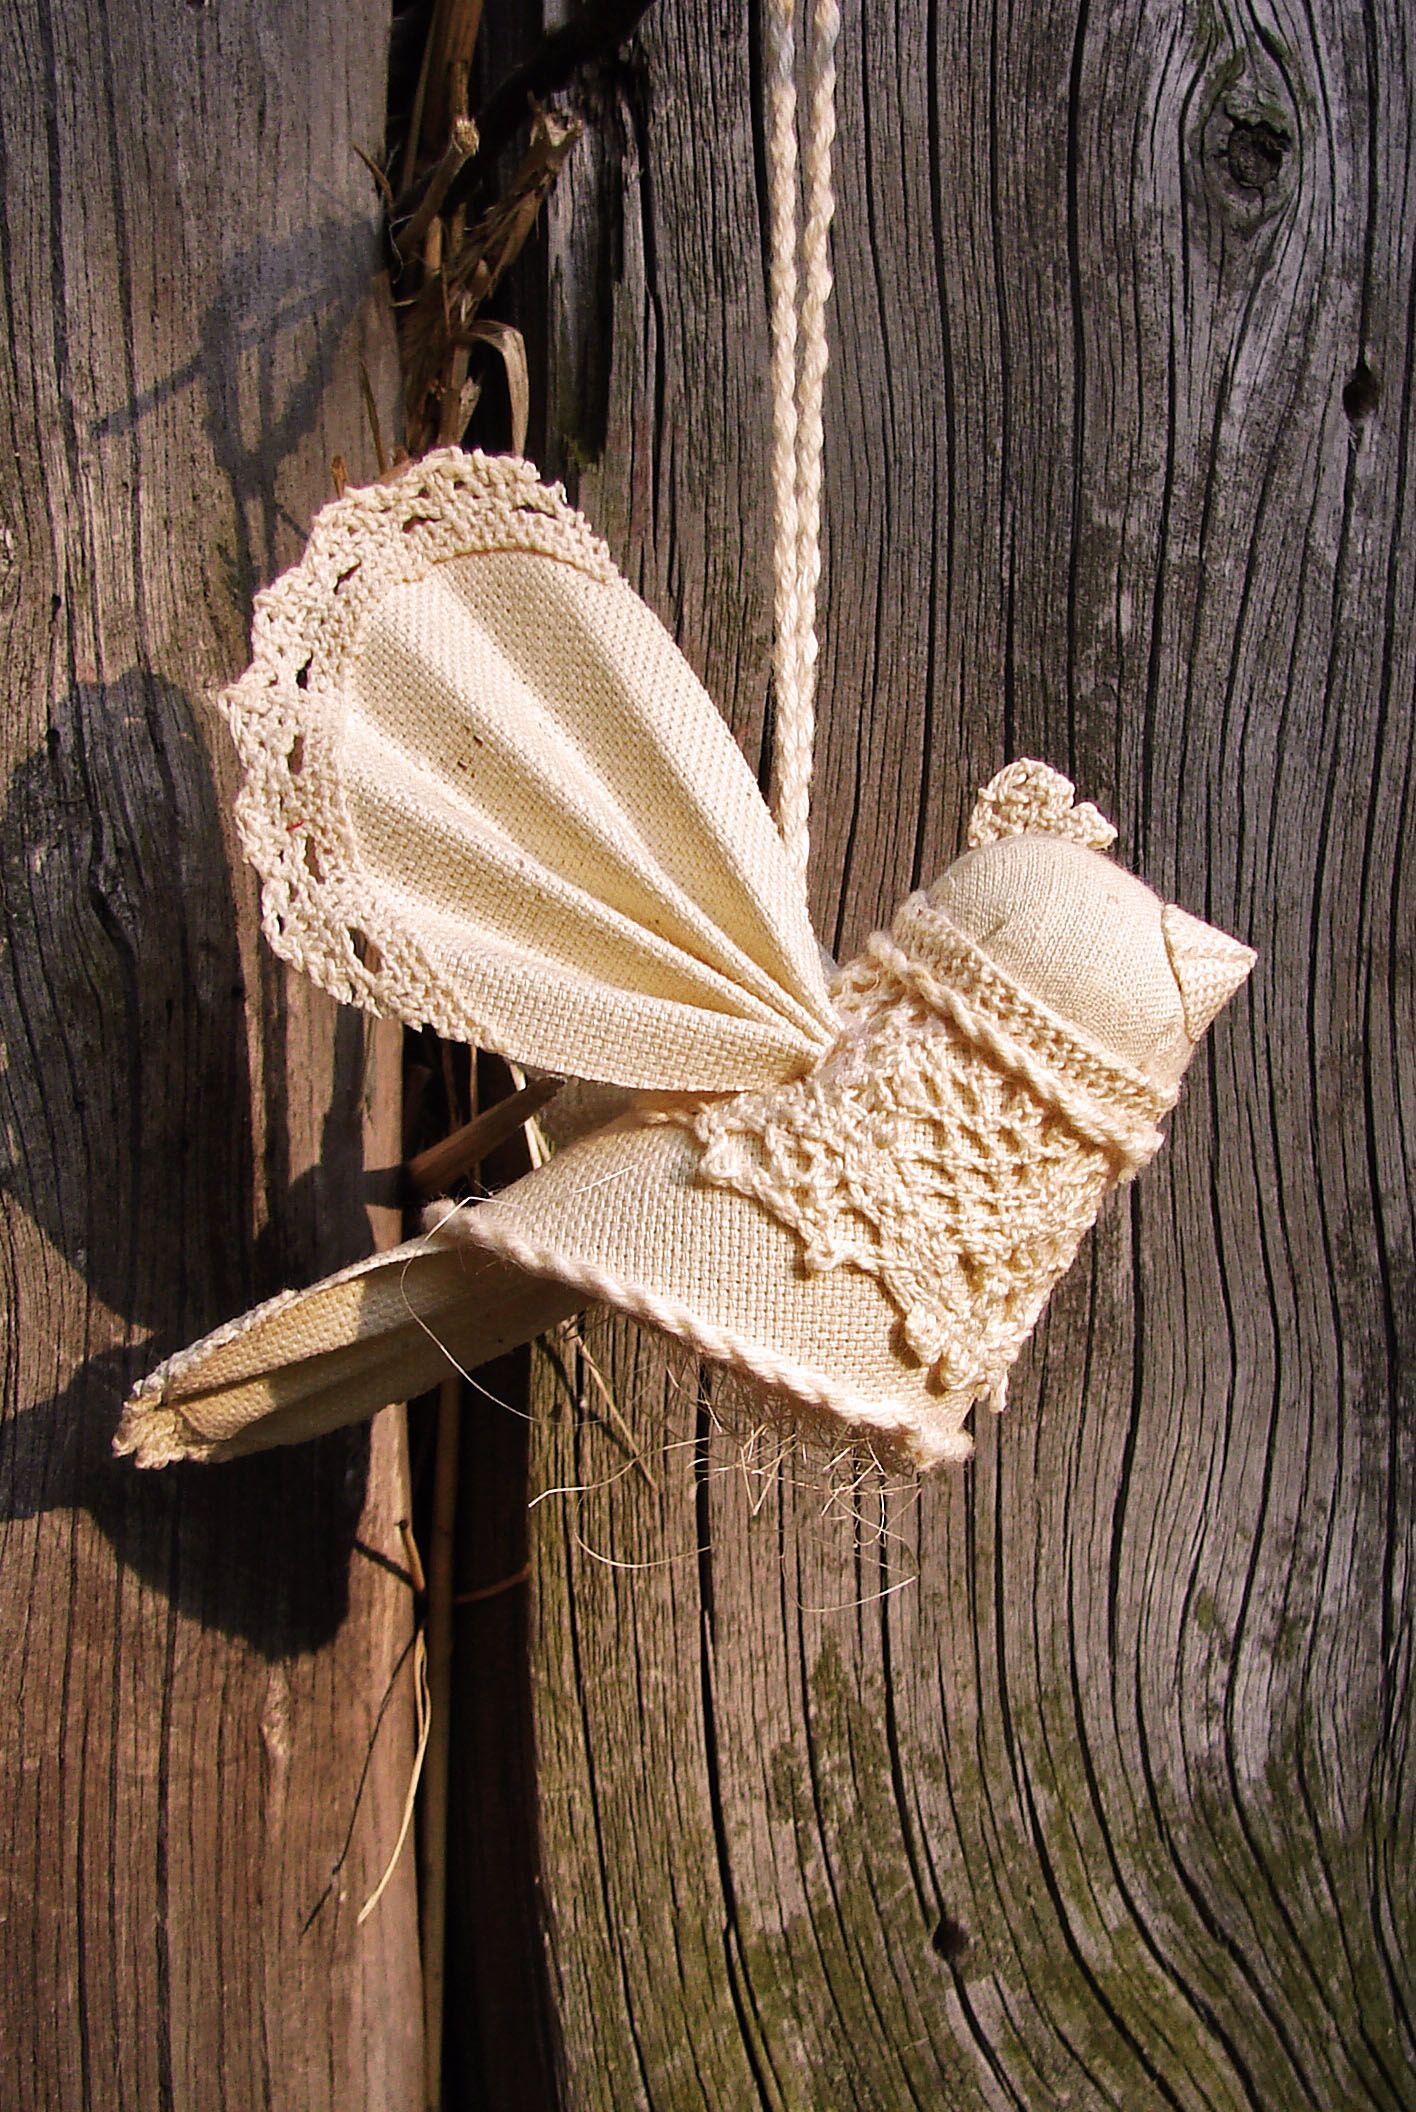 Bird Handmade Decor, Wedding Present, 1St Birthdai Gift, Christmas Decorations,